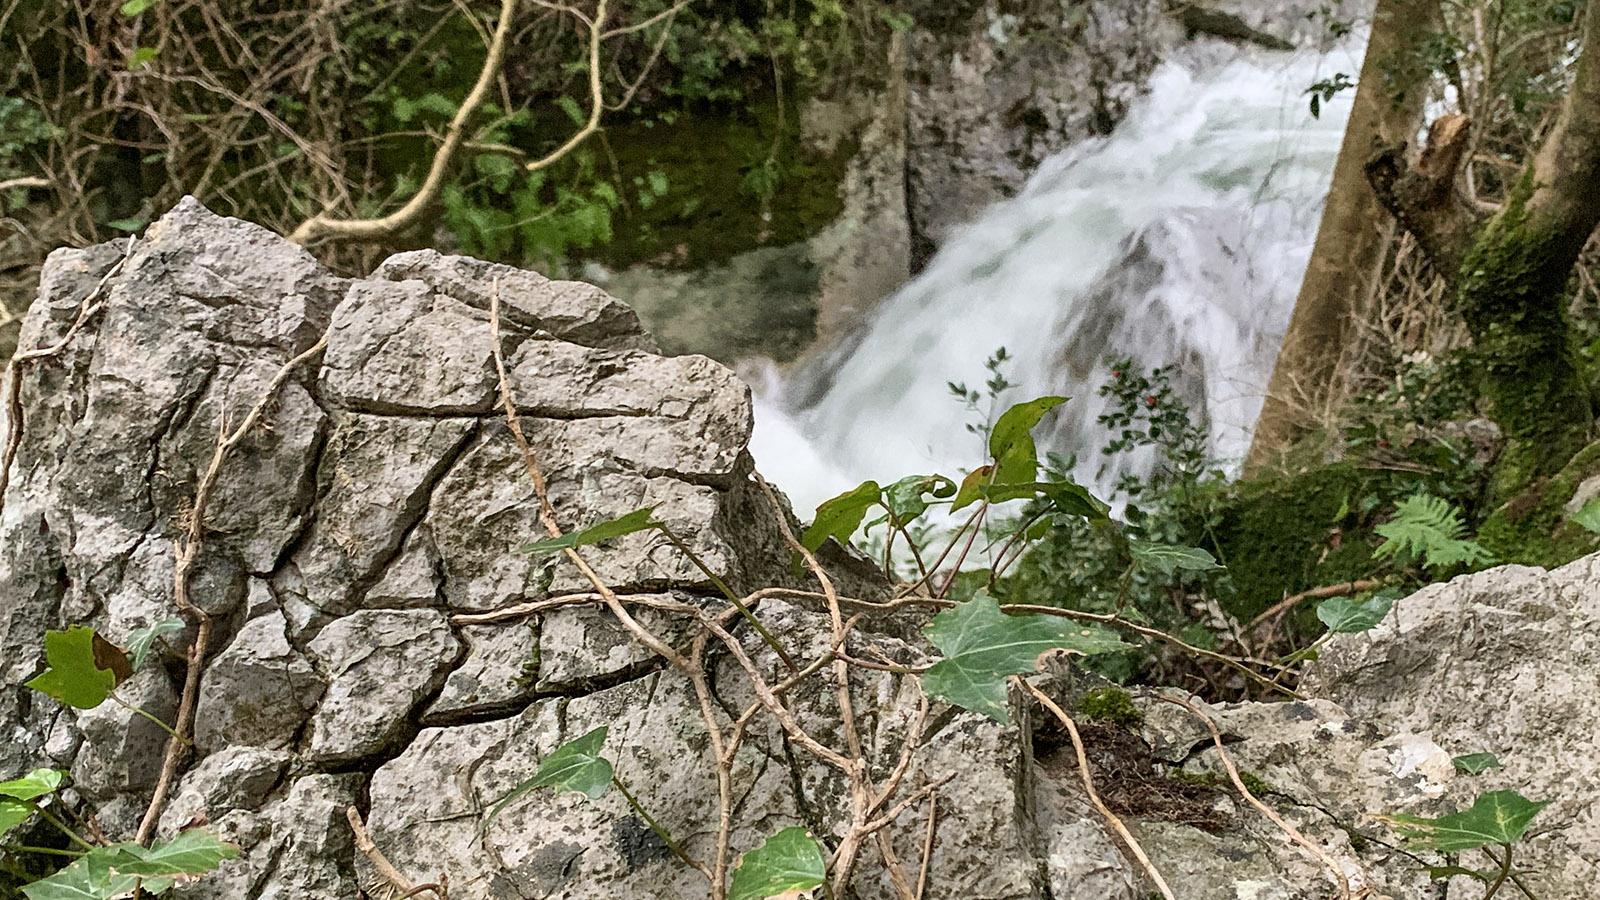 Gorges Saint-Jaume: Efeu erobert Felsen und Bäume. Foto: Hilke Maunder